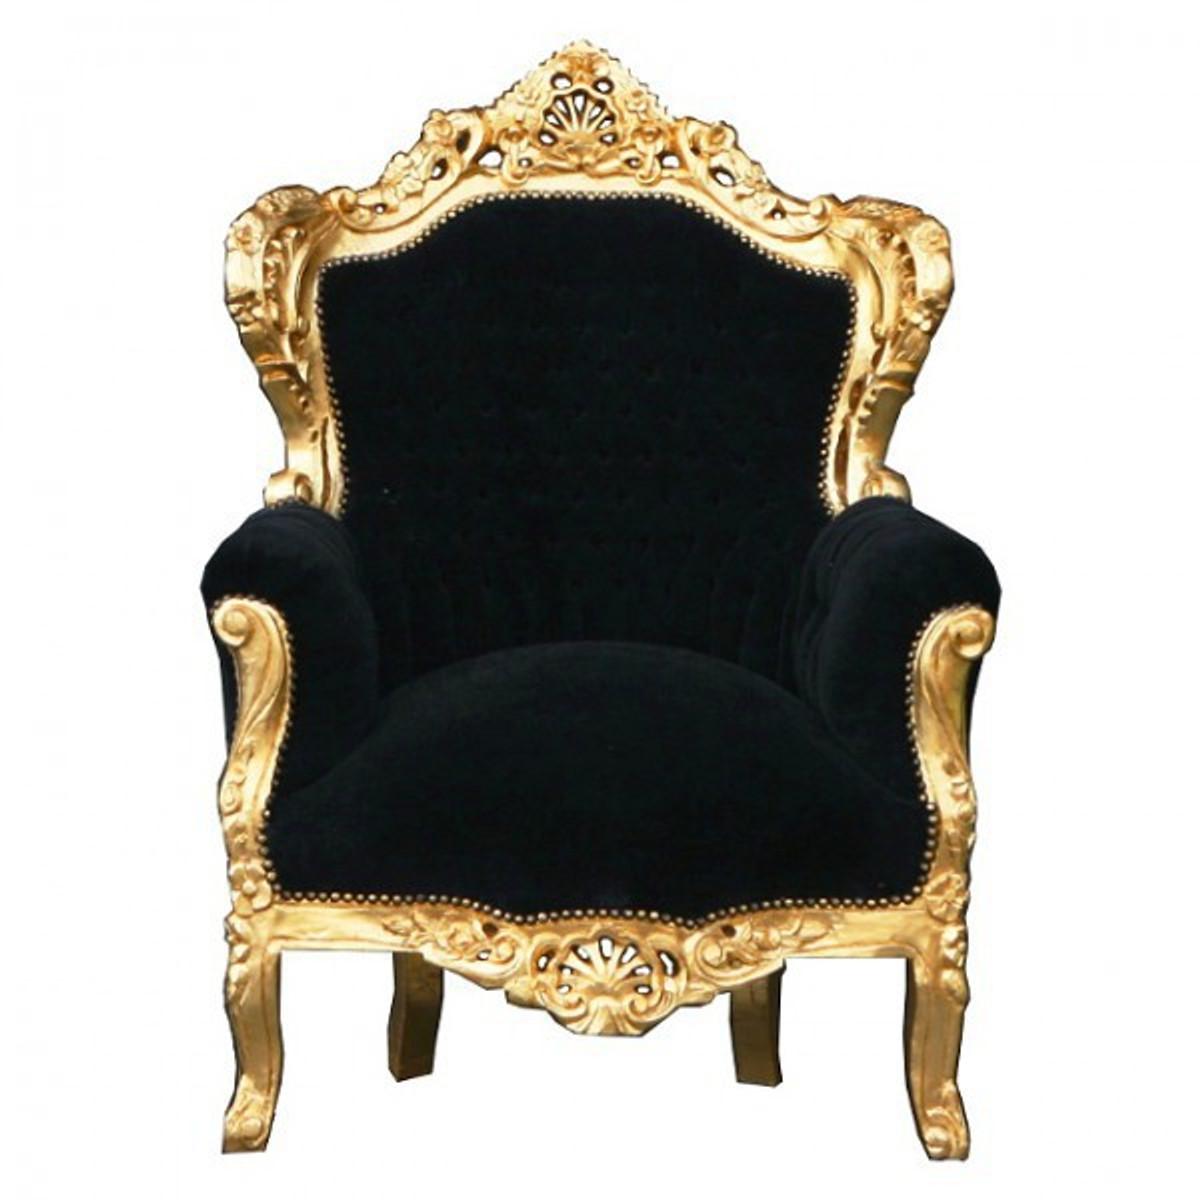 Barock Polster Sessel Thron Barocksessel Antik Möbel